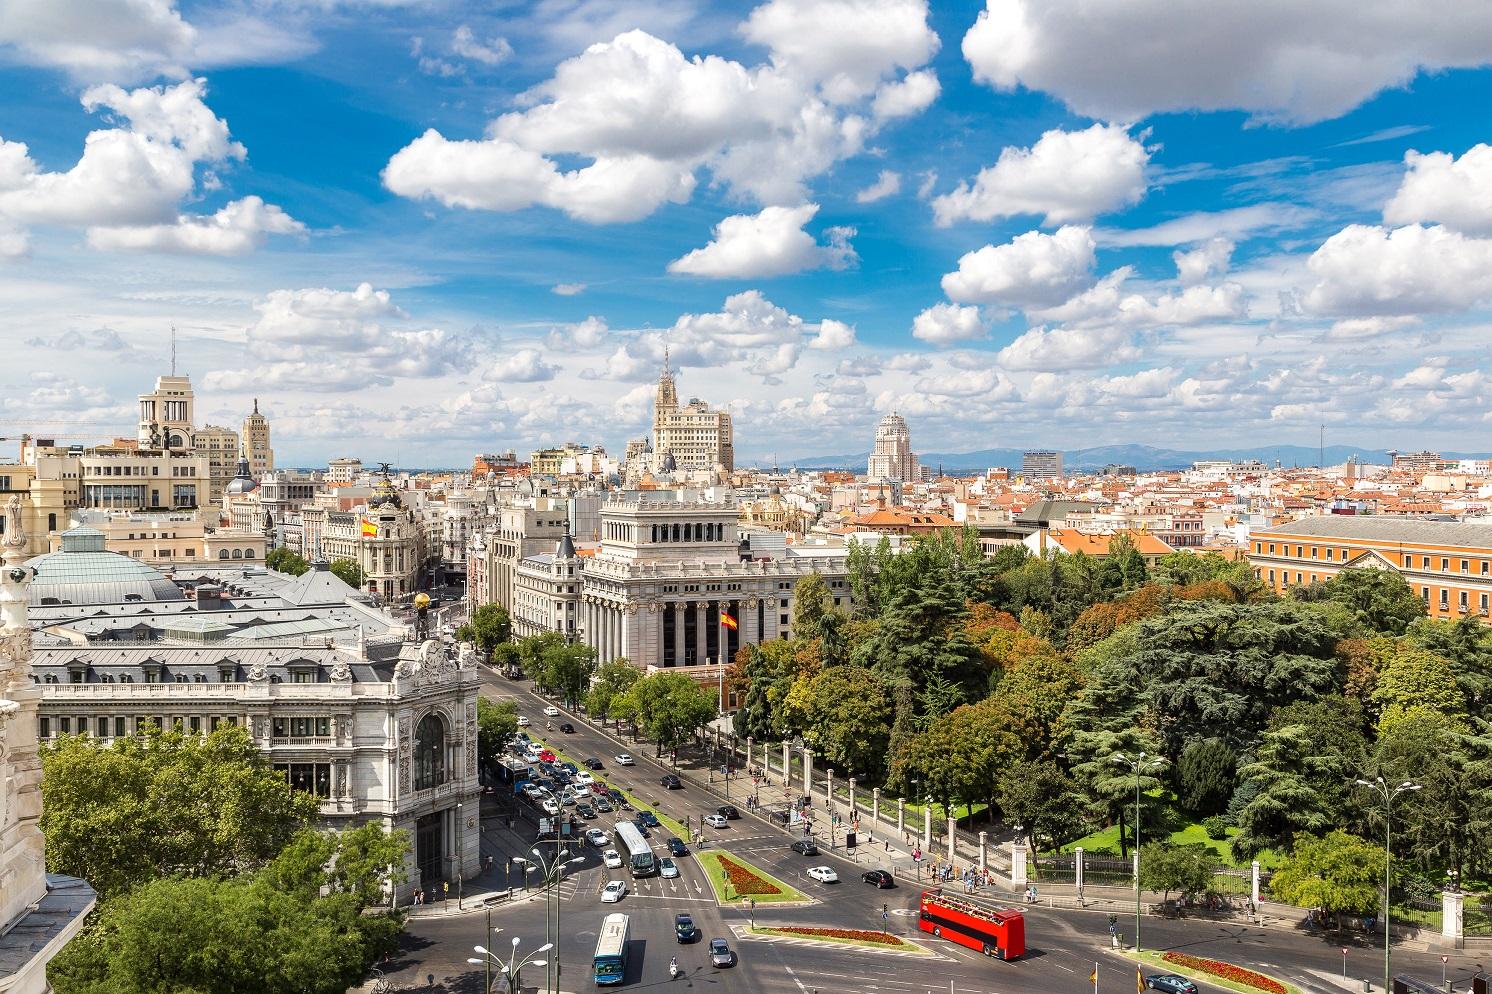 Madrid-in-a-beautiful-summer-day-Spain_shutterstock_322471106